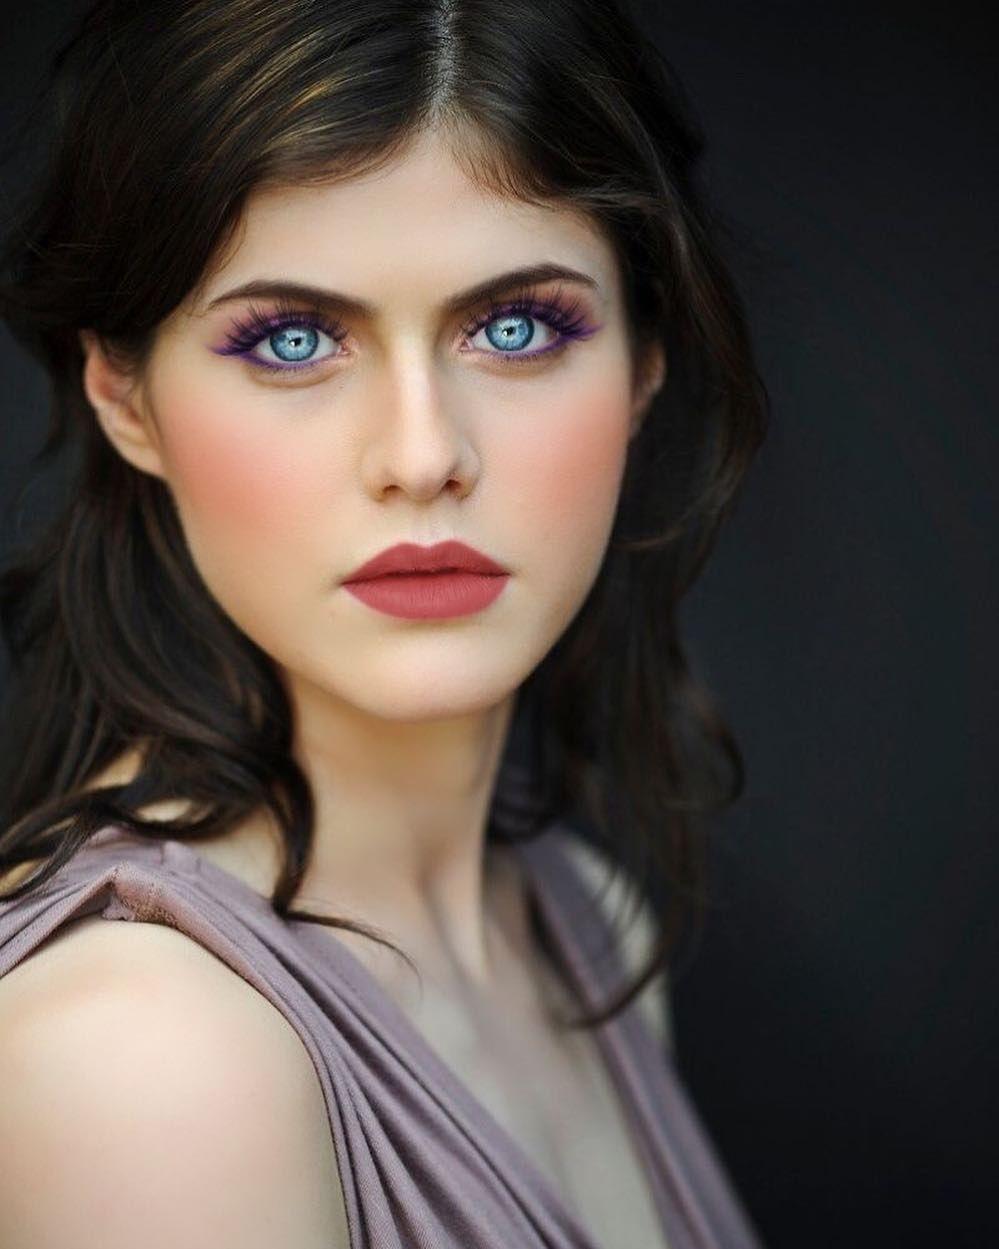 Alexandra Daddario Instagram